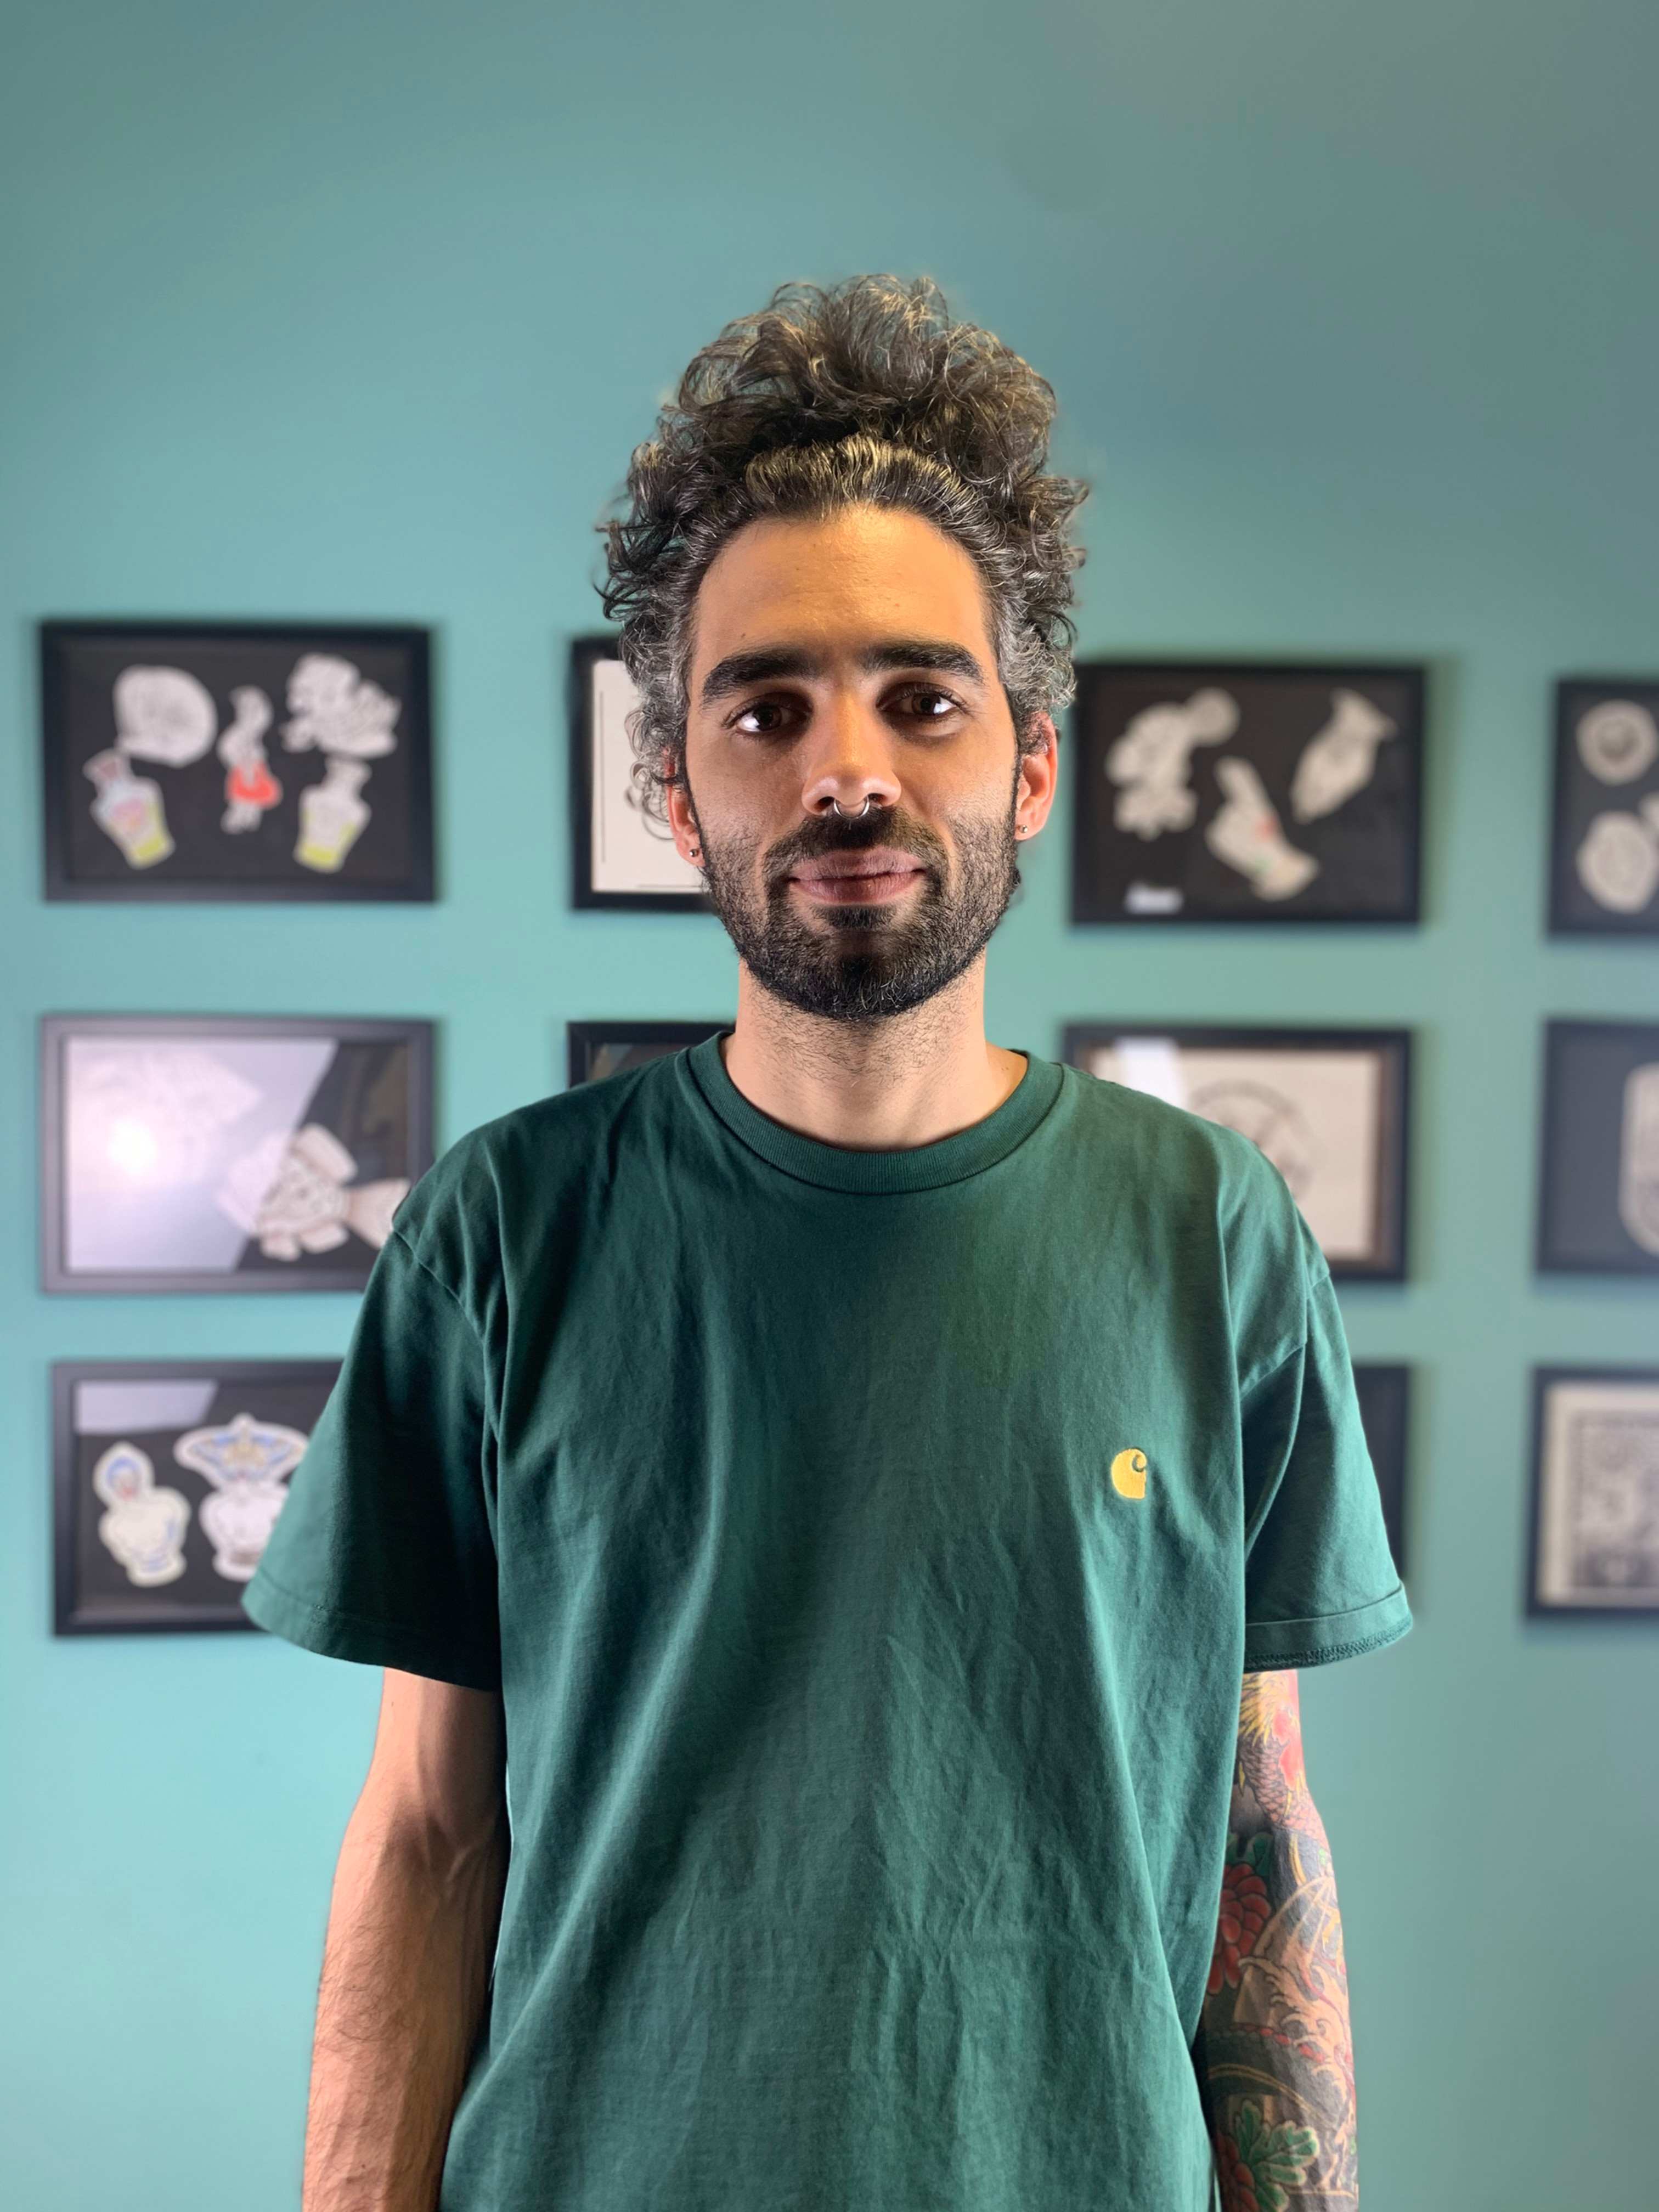 Tattoo Session by Morus Nigra